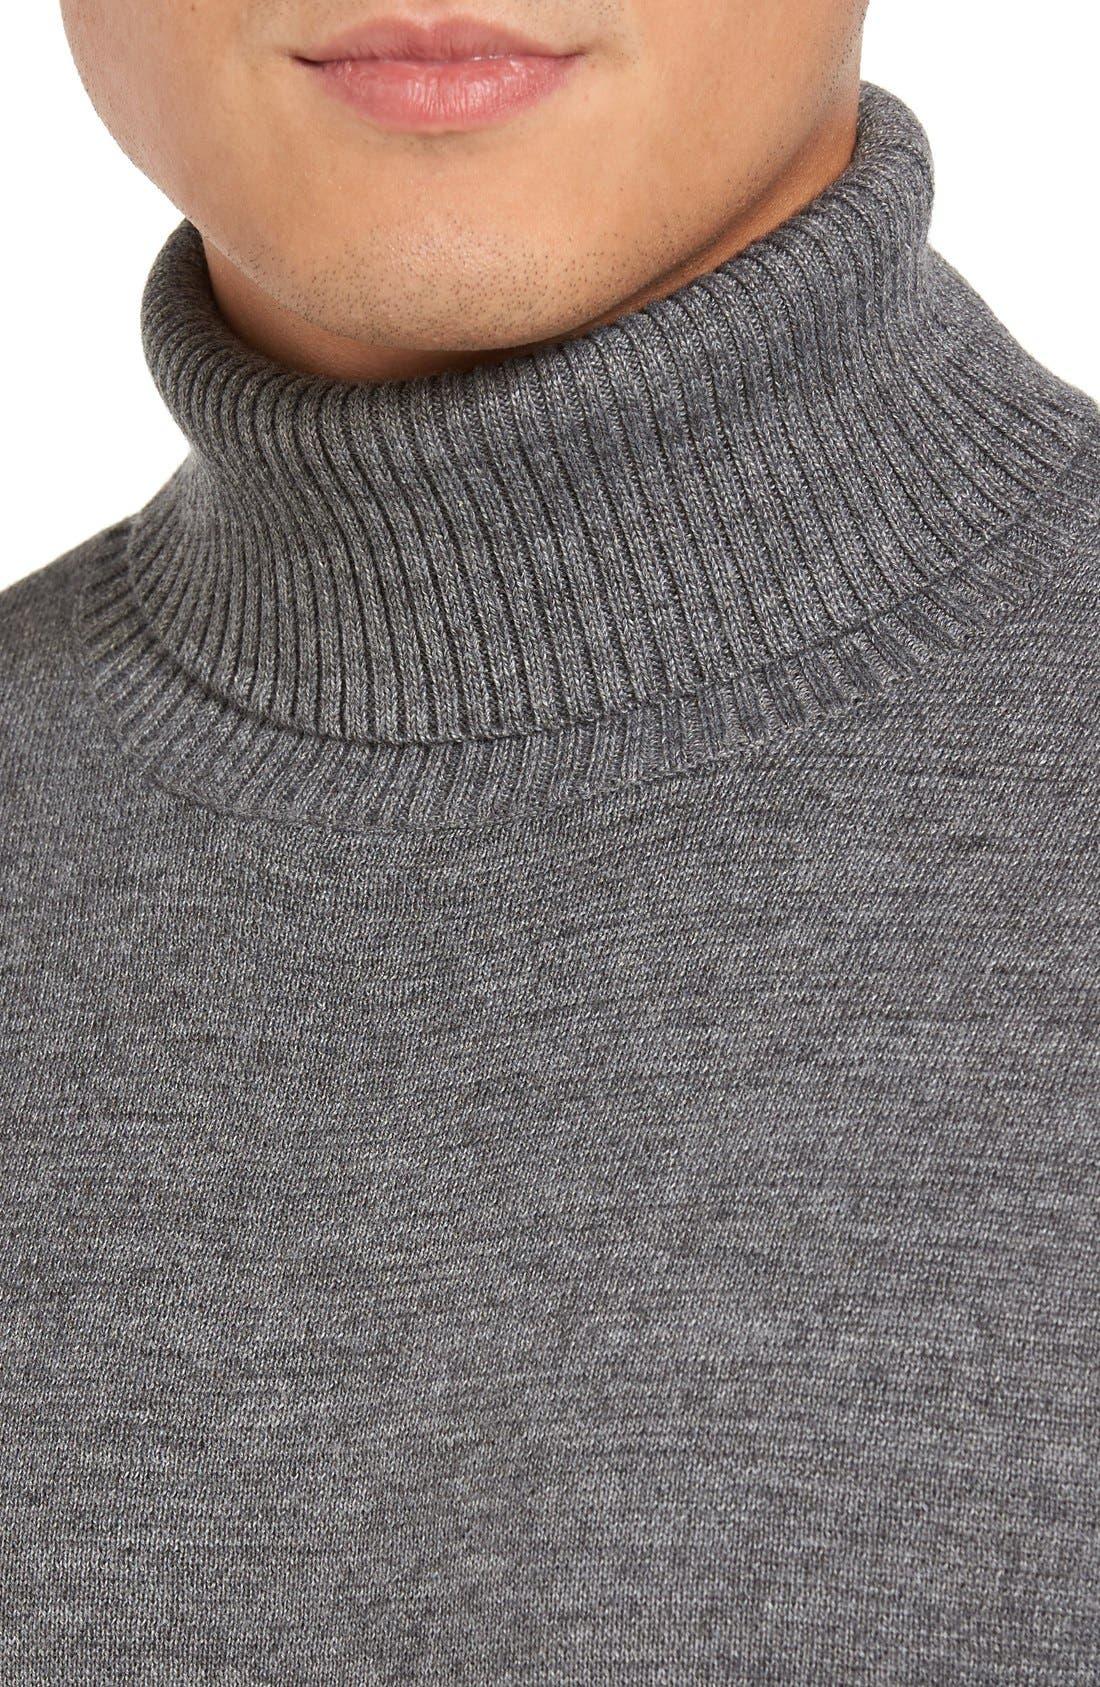 Merino Wool Blend Turtleneck Sweater,                             Alternate thumbnail 5, color,                             020